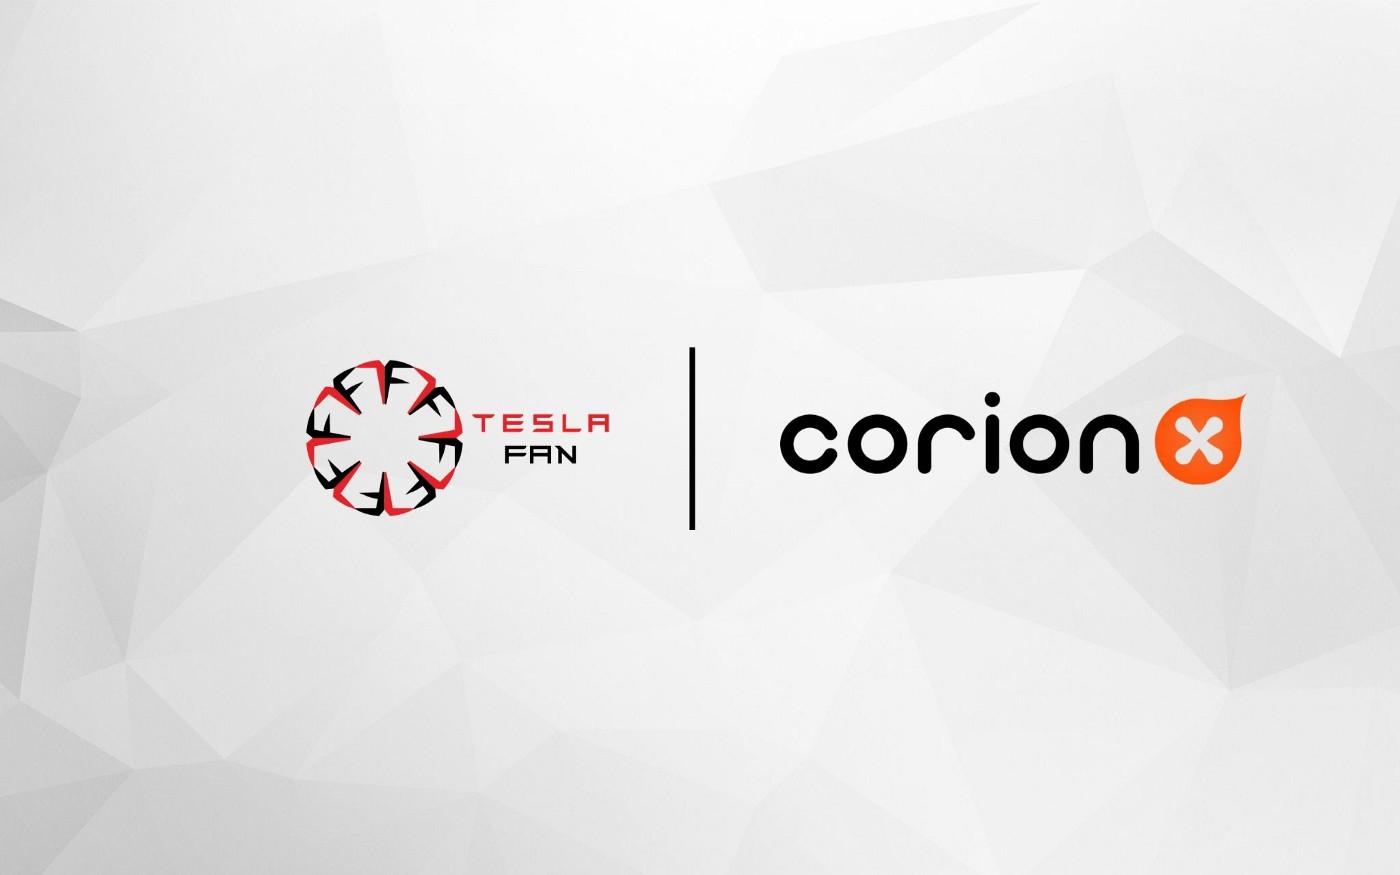 CorionX and Teslafan Partnership Announcement